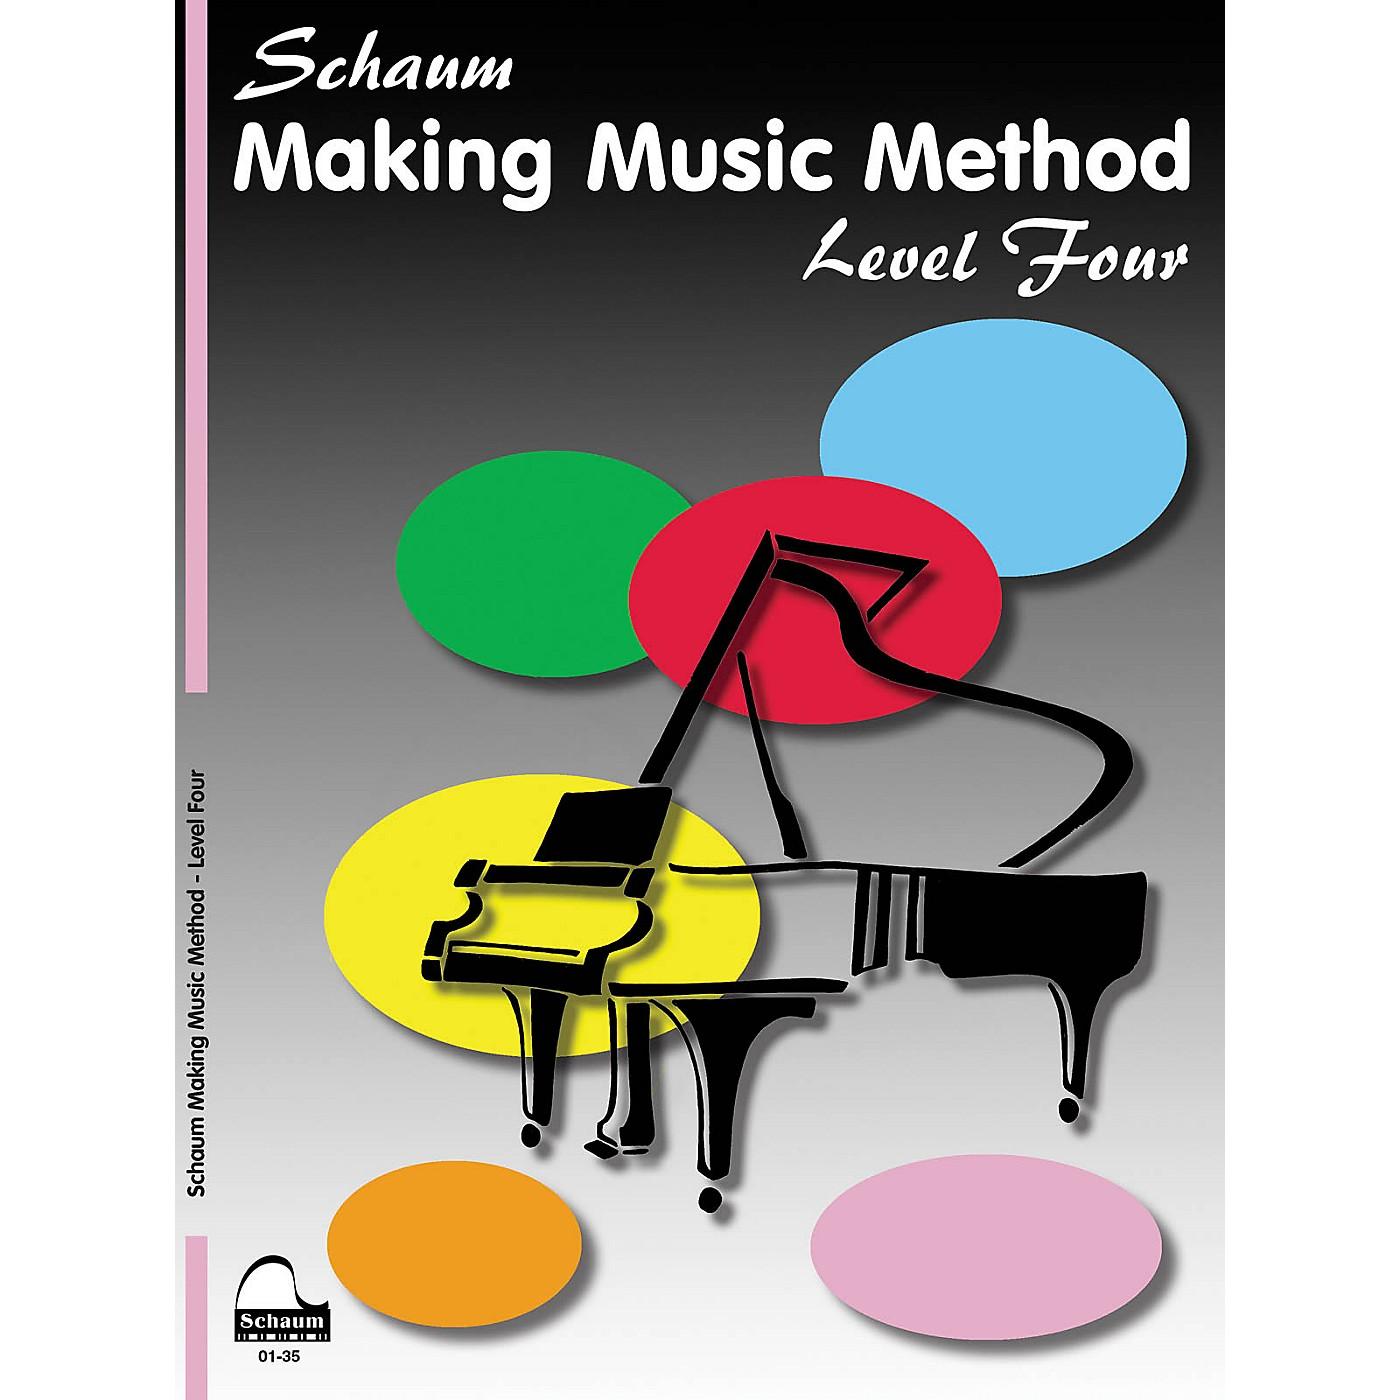 SCHAUM Making Music Method (Level 4 Inter Level) Educational Piano Book by John W. Schaum thumbnail